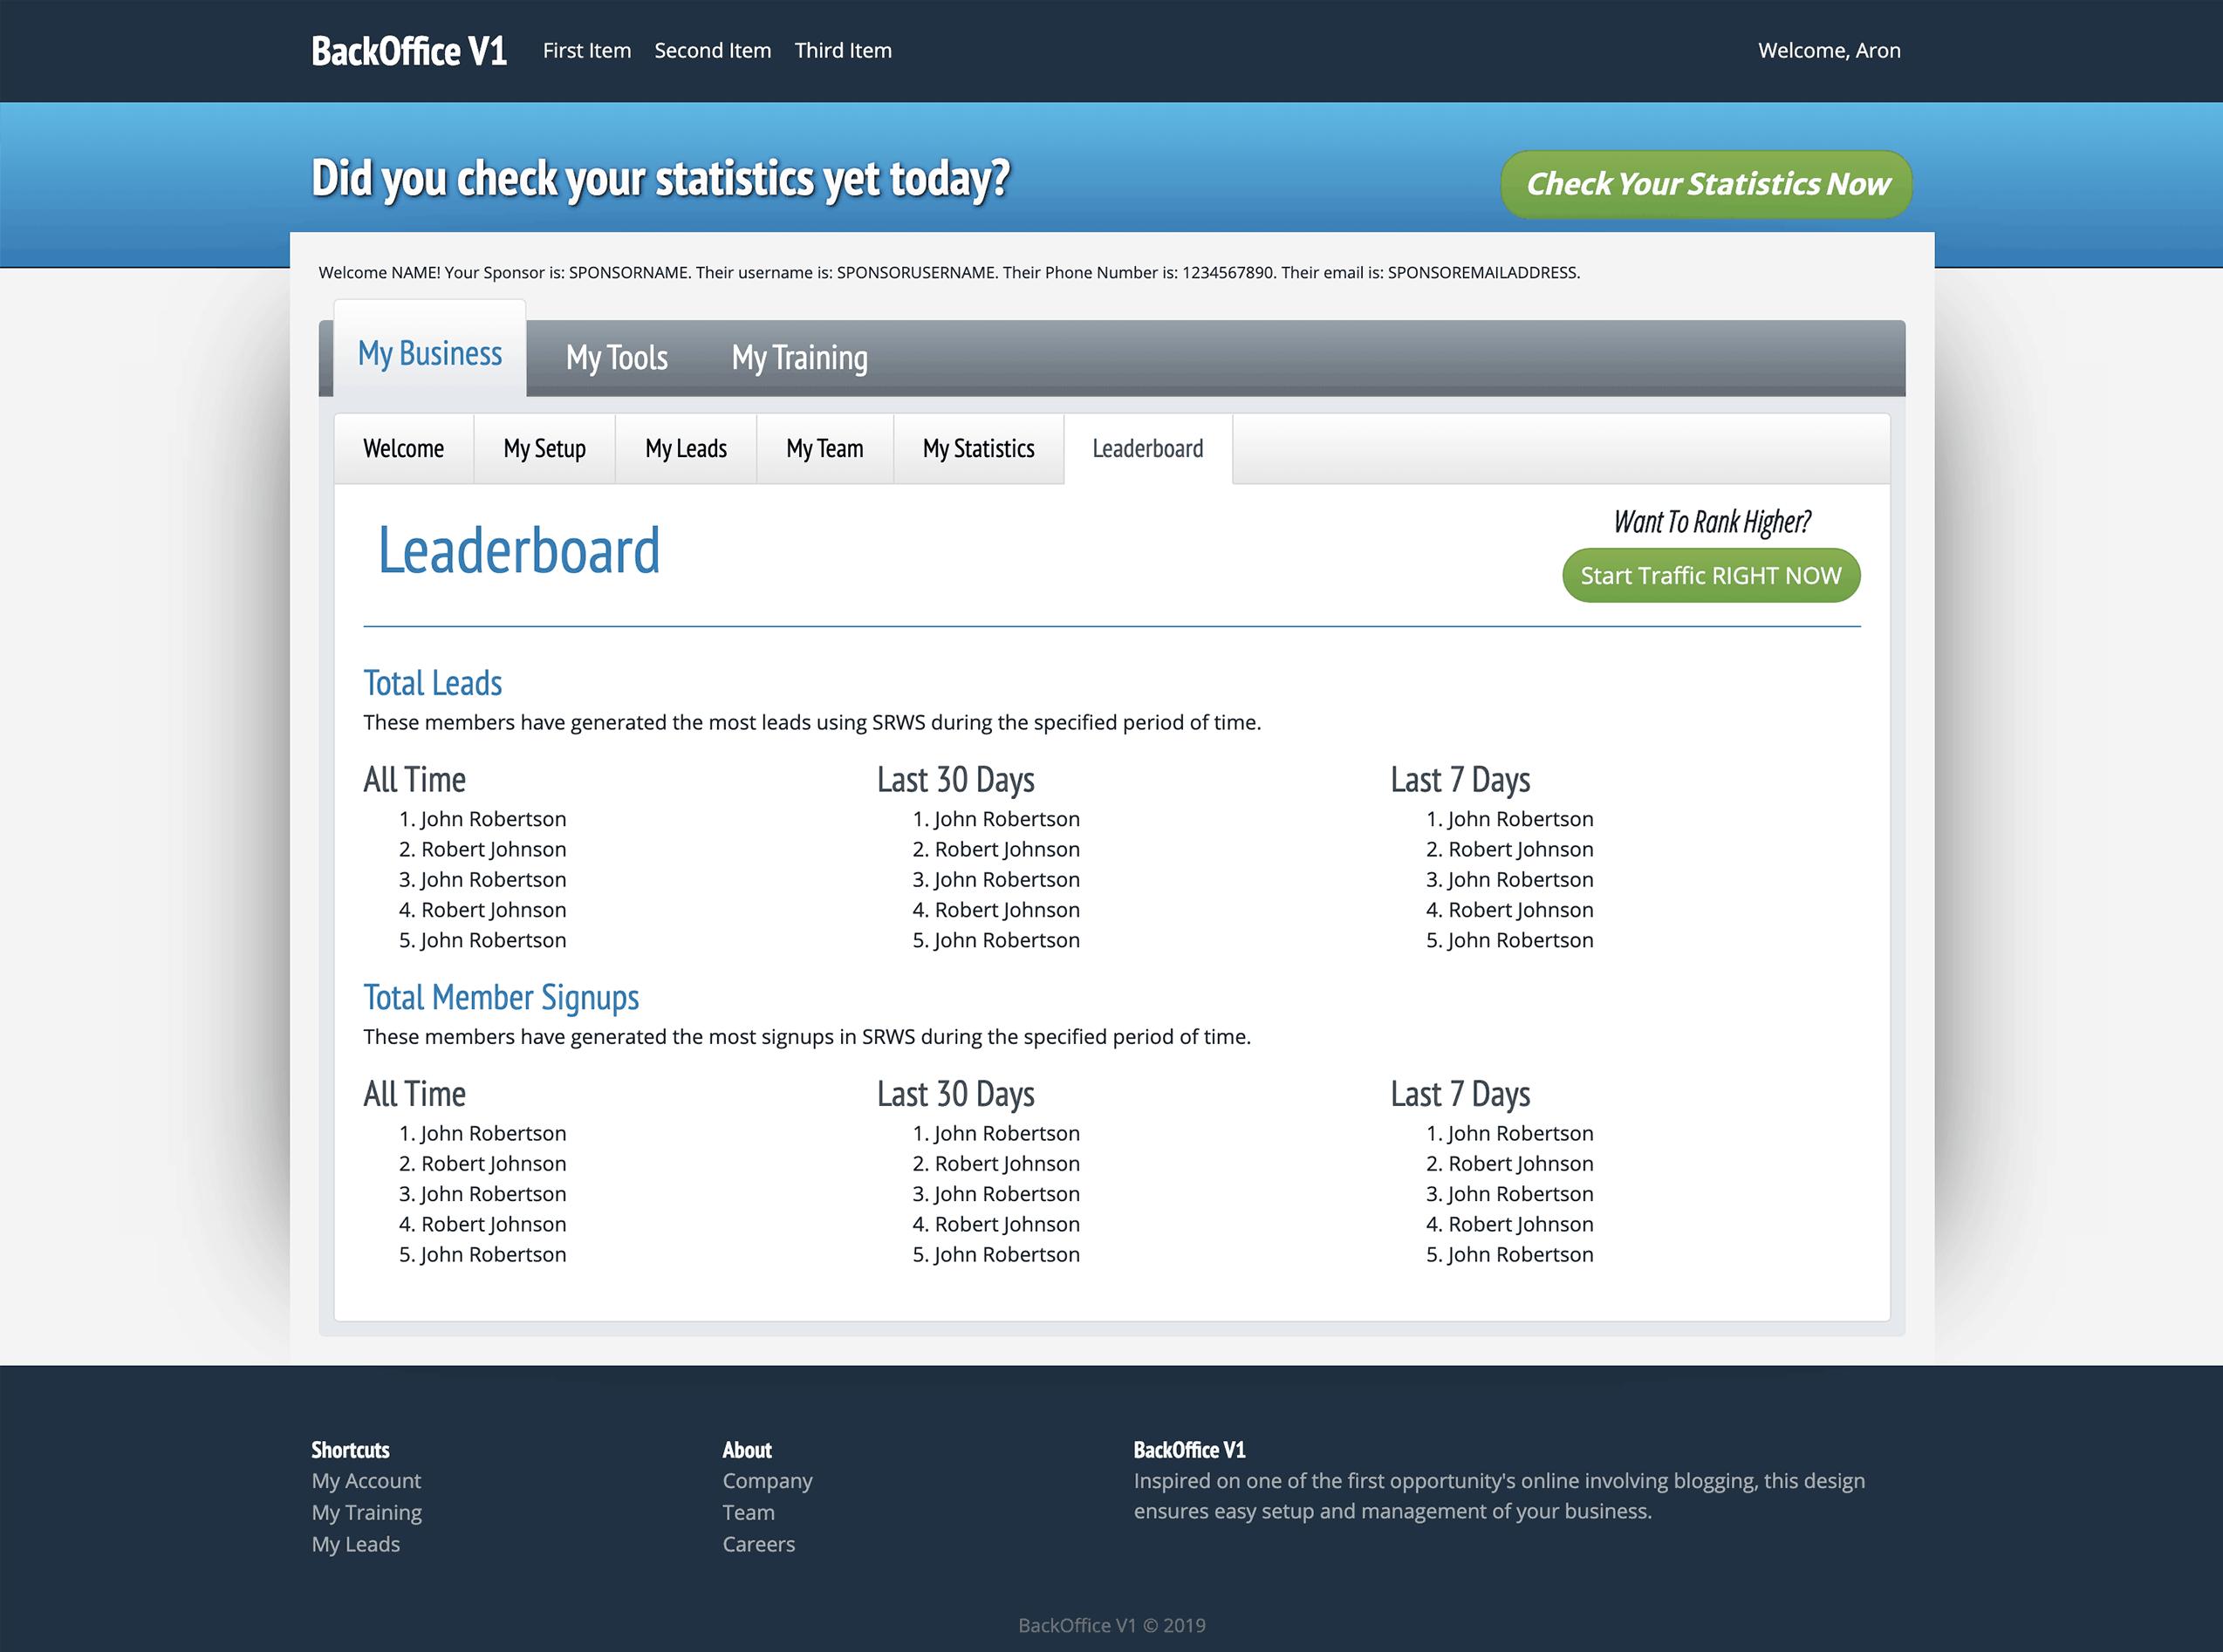 Backoffice Leaderboard